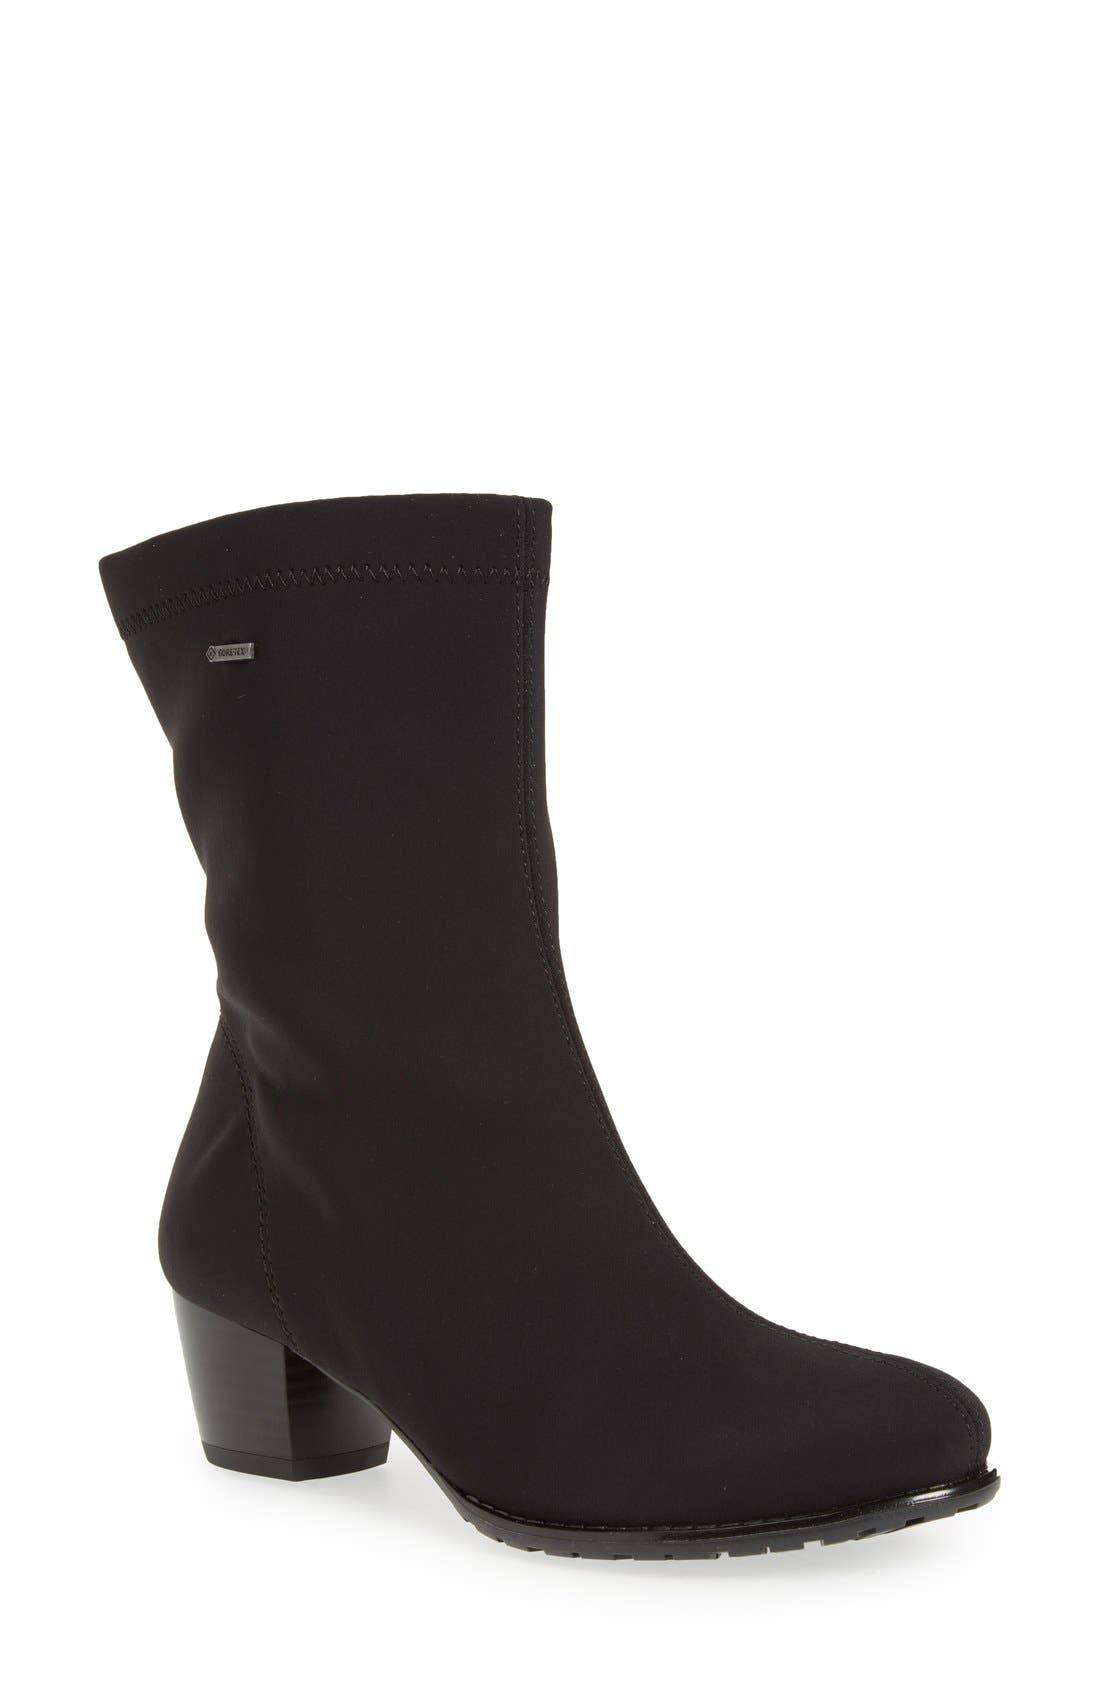 Alternate Image 1 Selected - ara 'Fairfax' Waterproof Gore-Tex® Block Heel Boot (Women)